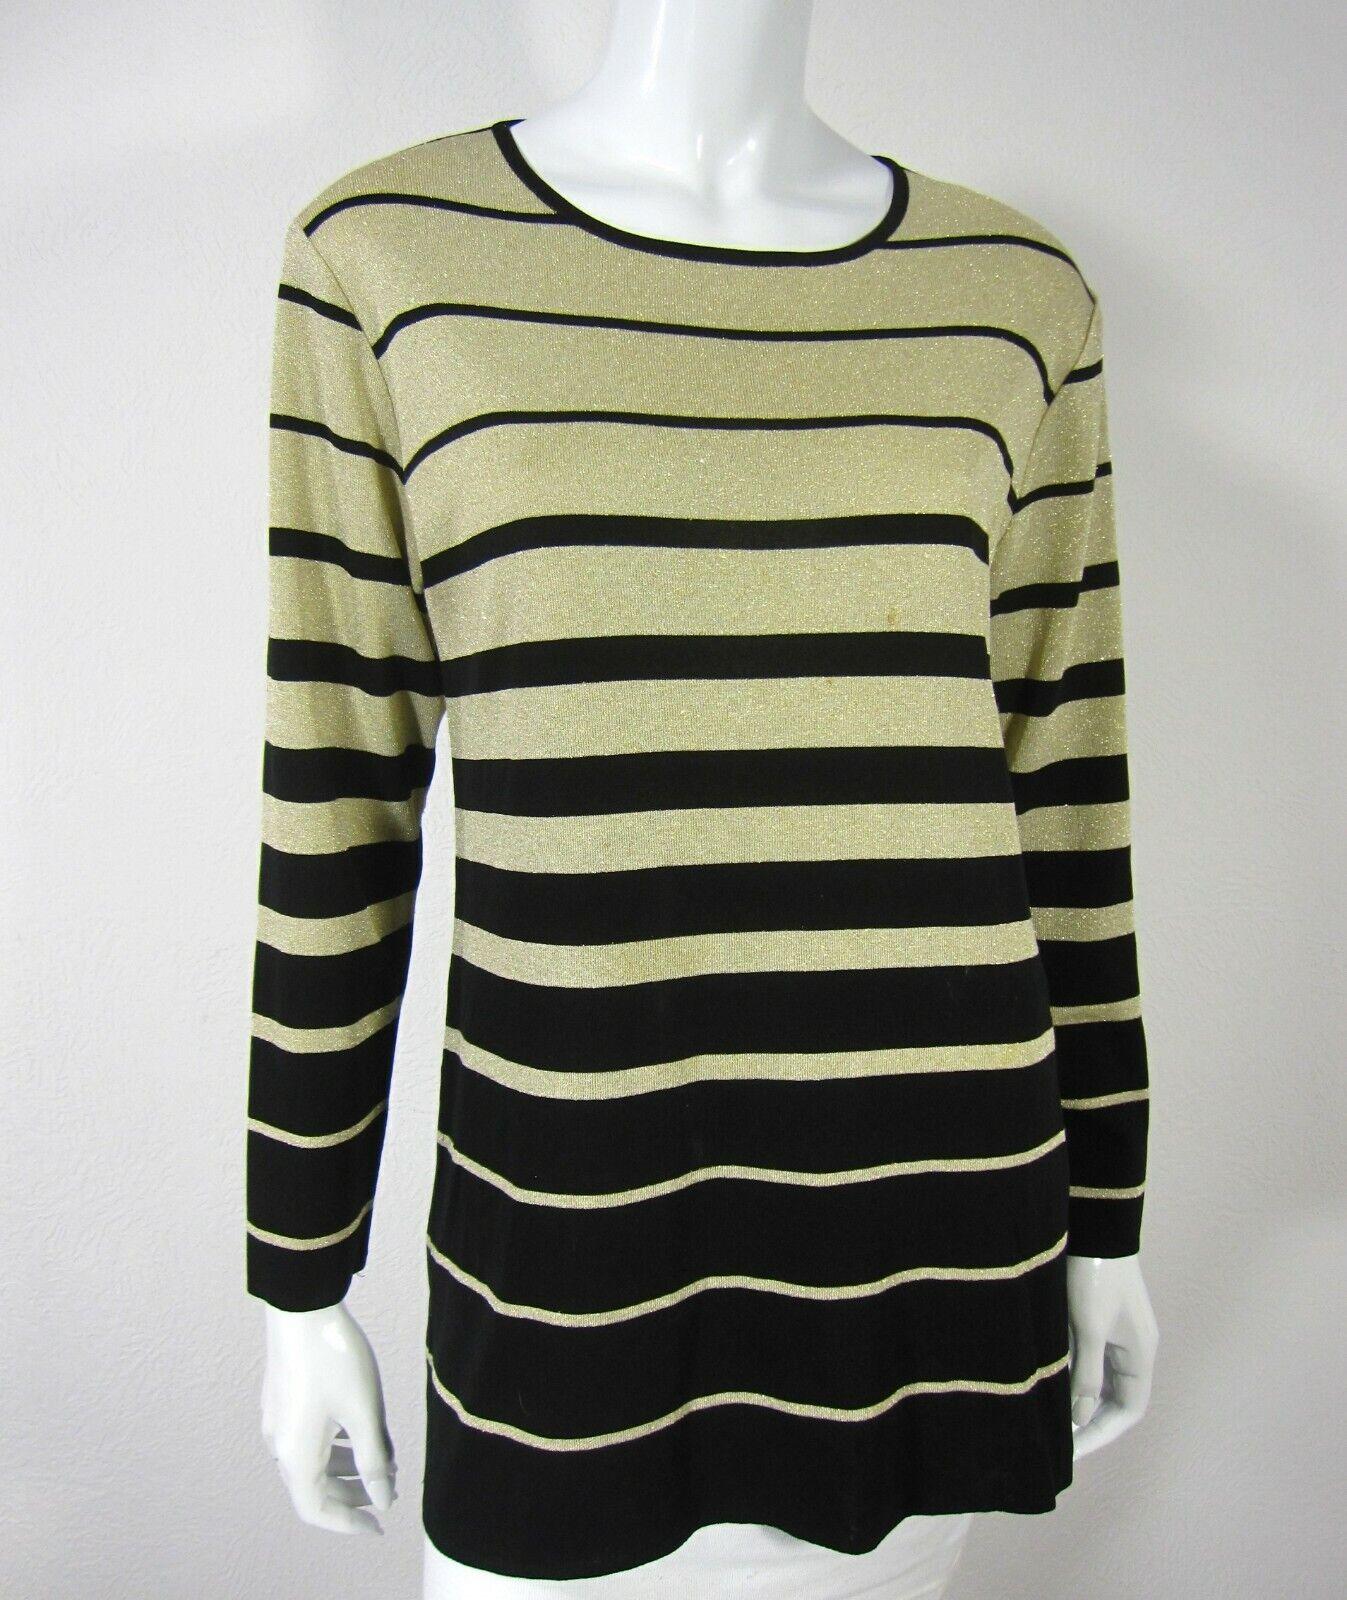 Exclusively Misook Long Sleeve Crew Neckline Blouse Sweater M Medium schwarz Gold